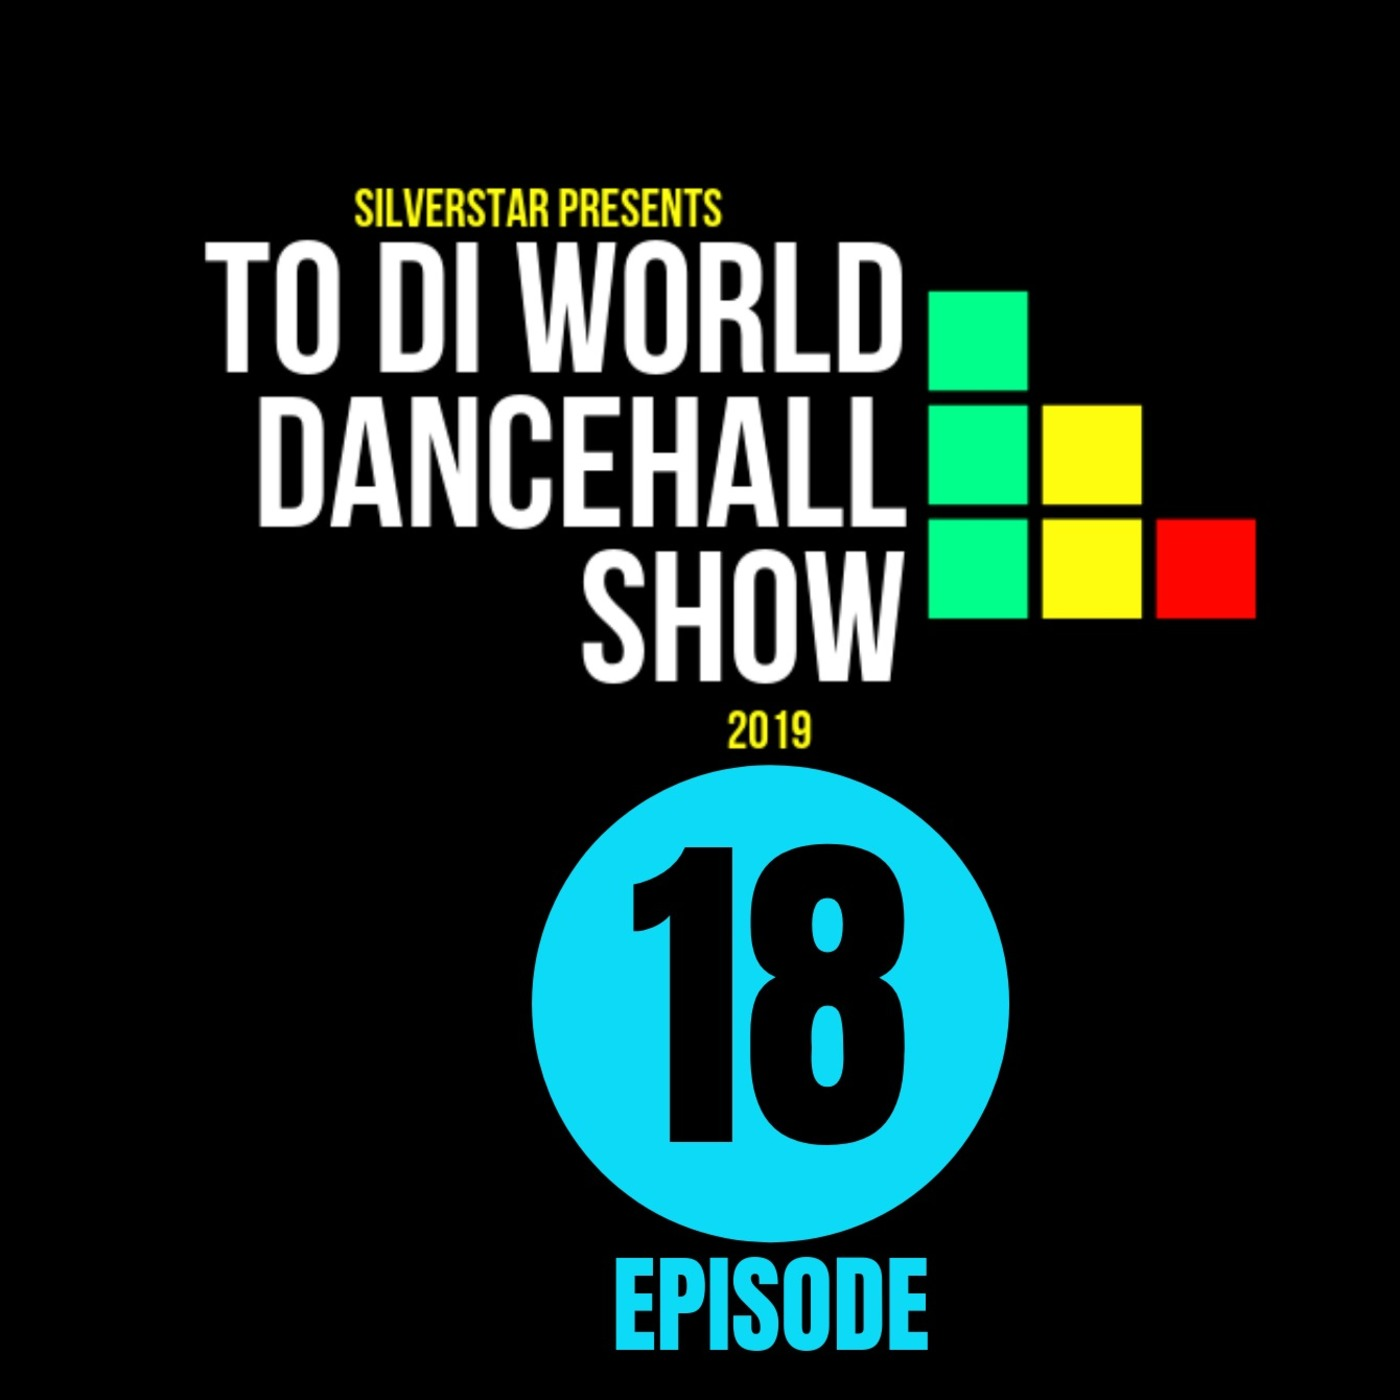 Episode 18 New Reggae Dancehall Podcast 2019 Silver Star